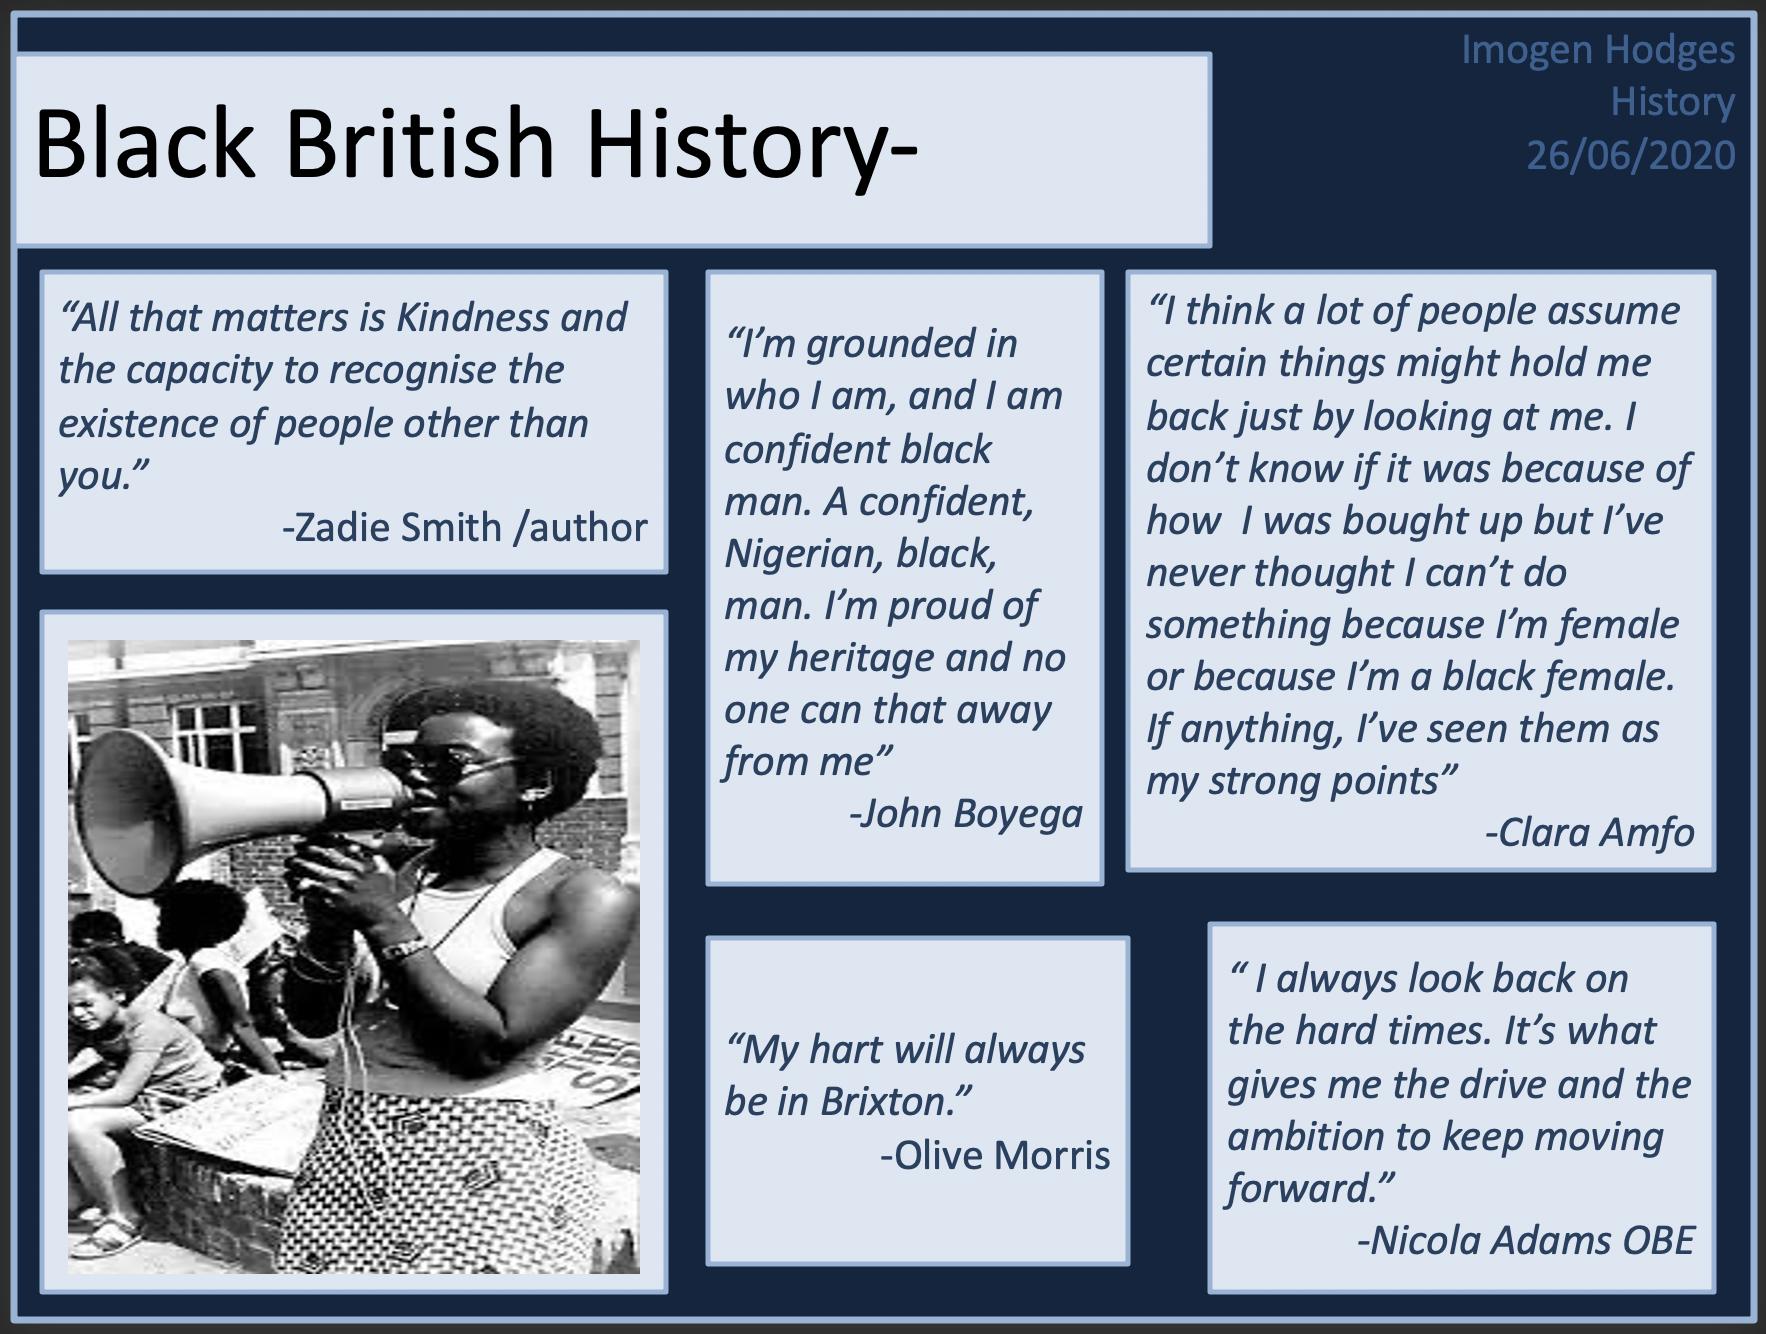 06/07/20 - Black History in Britain